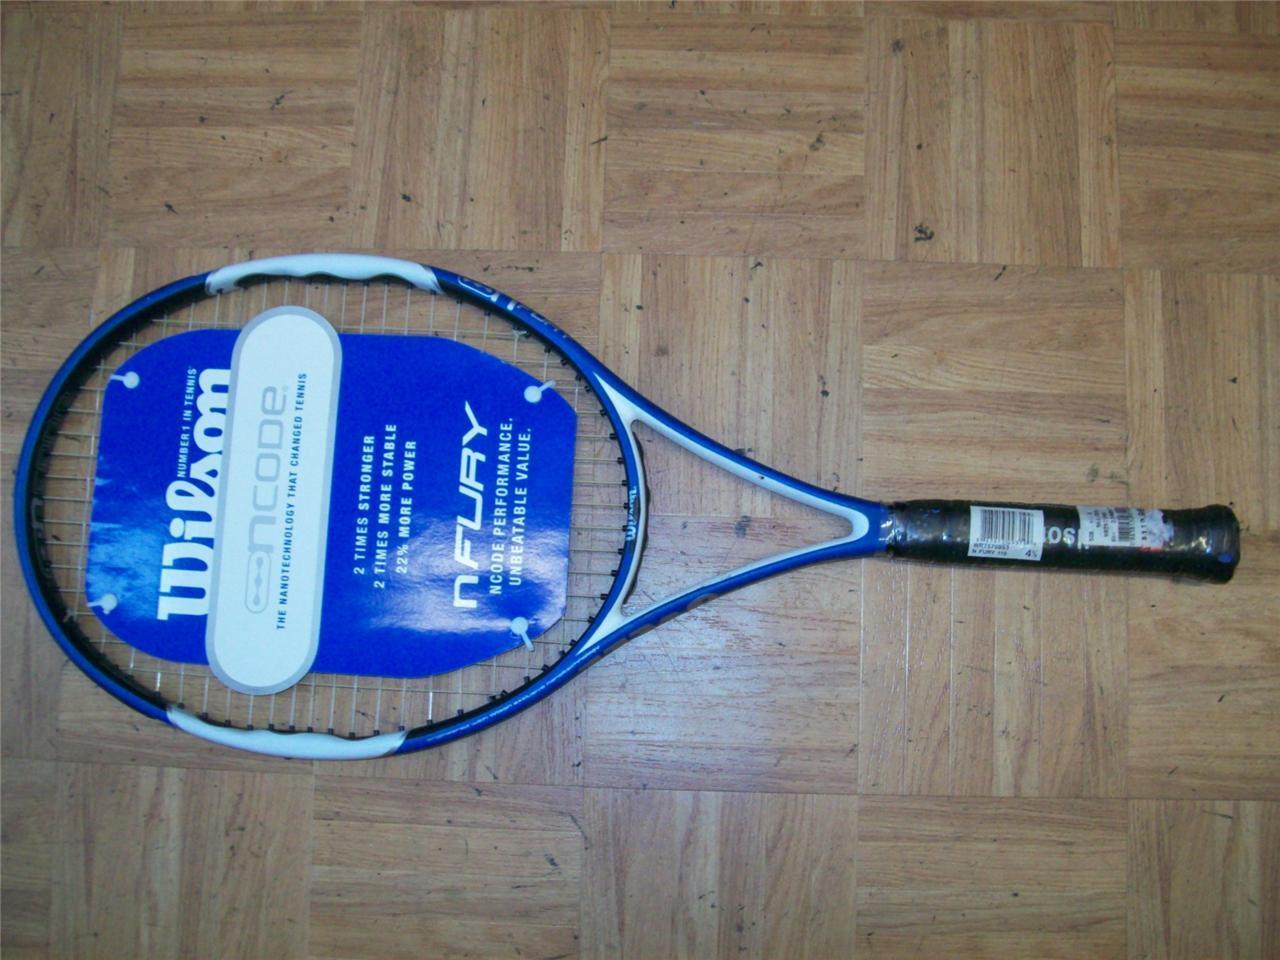 Nouveau Wilson N Code N Fury OverGröße 110 4 1 2 grip raquette de tennis